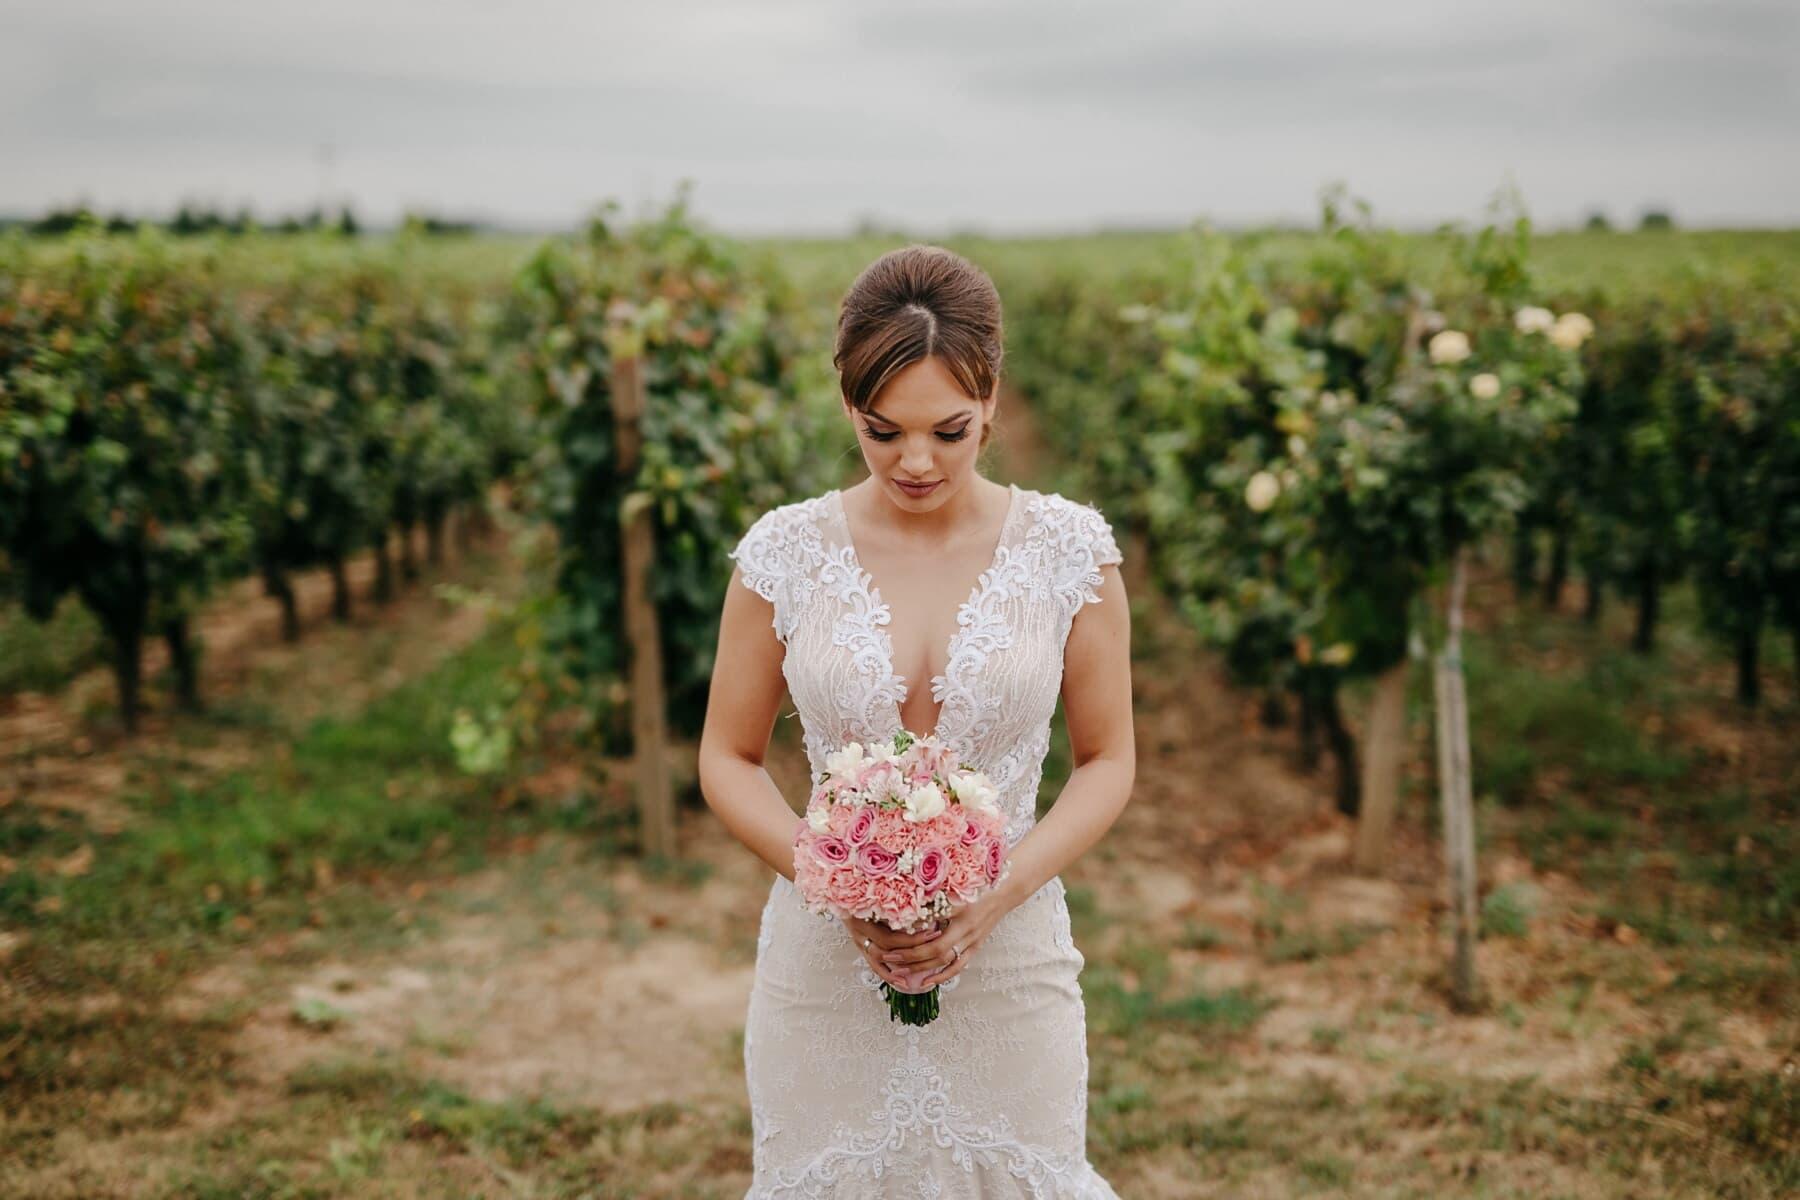 gorgeous, bride, brunette, wedding bouquet, wedding dress, standing, vineyard, wedding, girl, dress